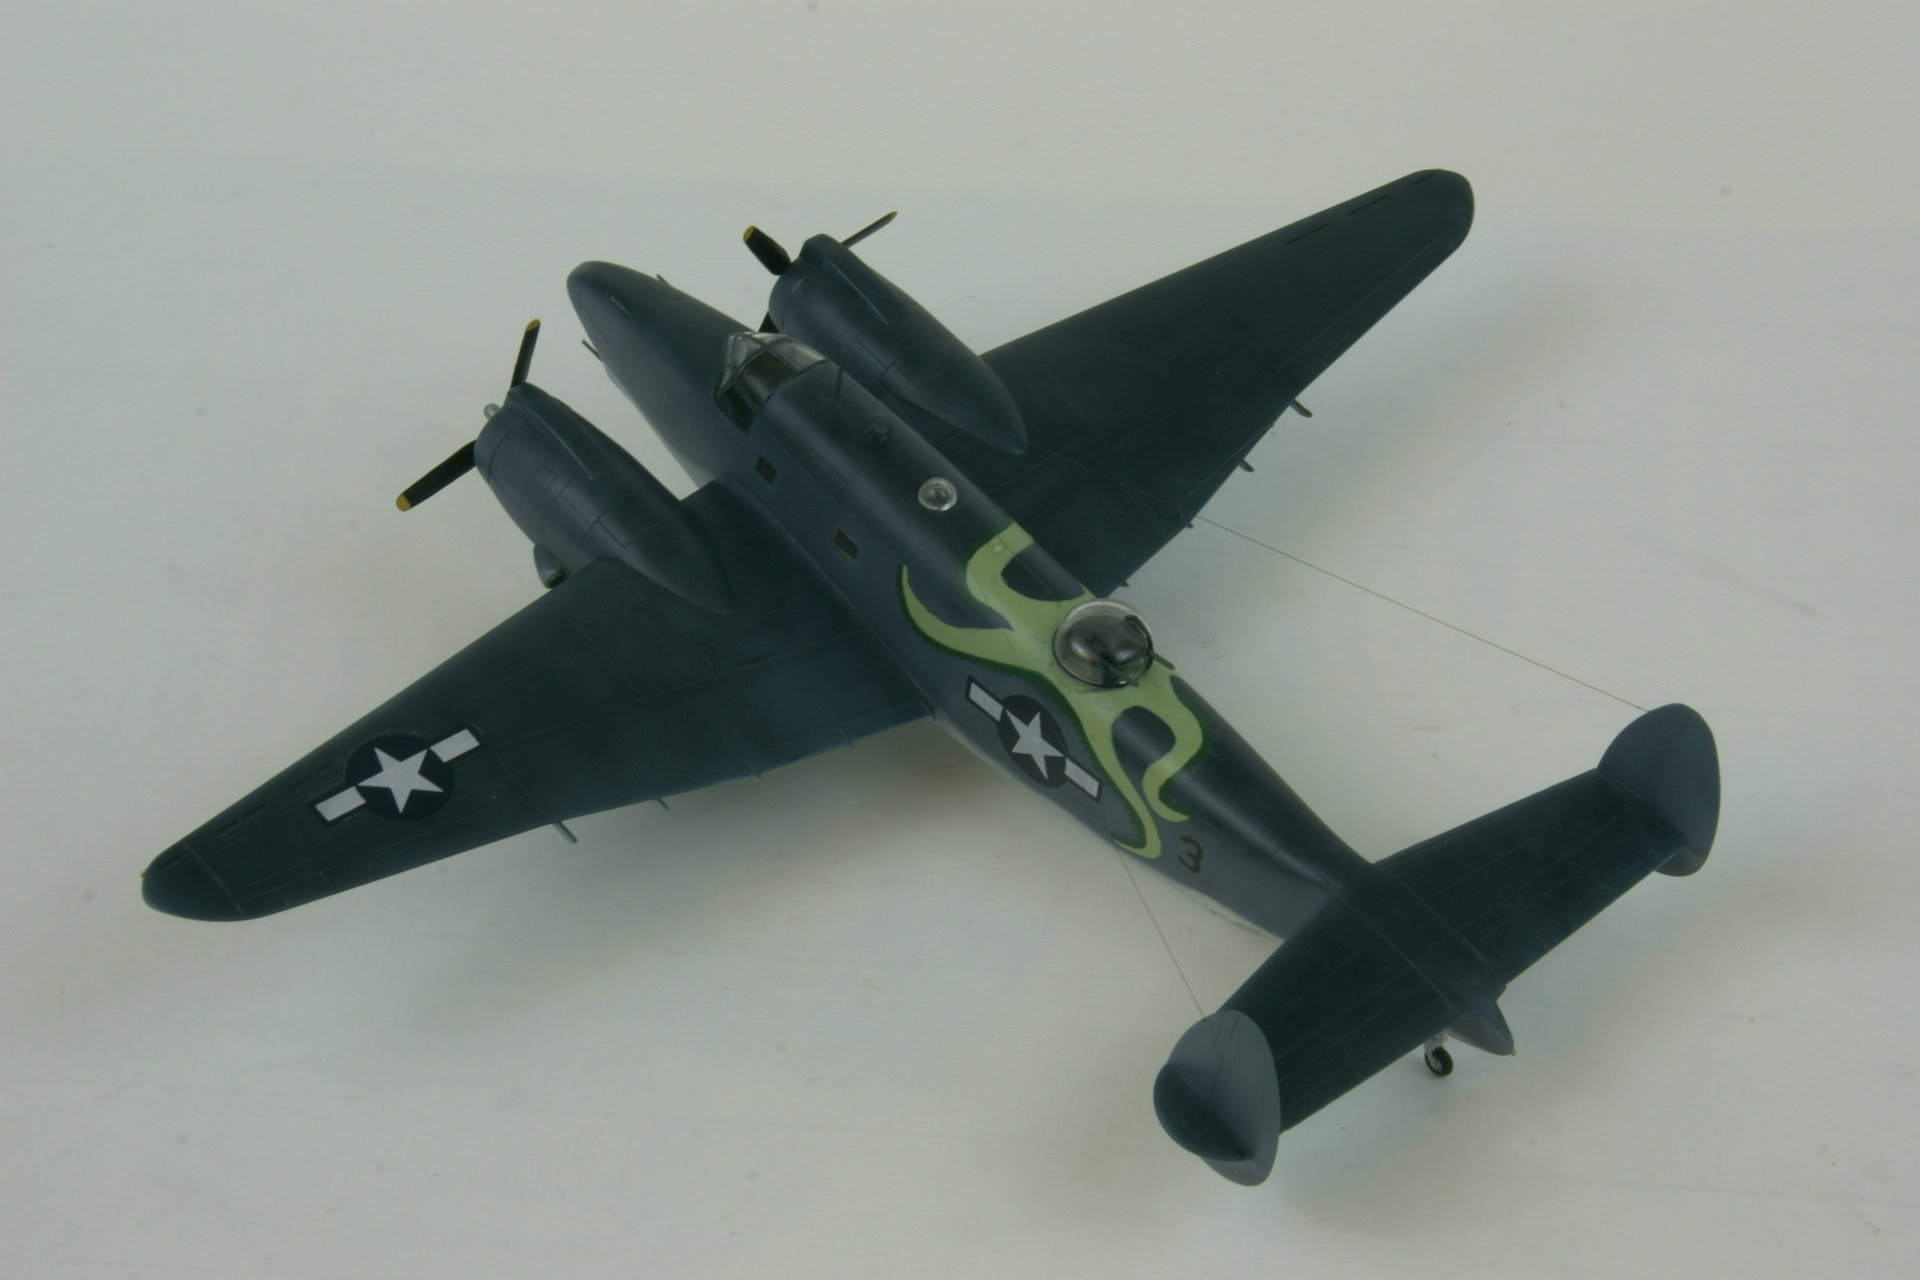 Lockheed pv 1 ventura 6 2